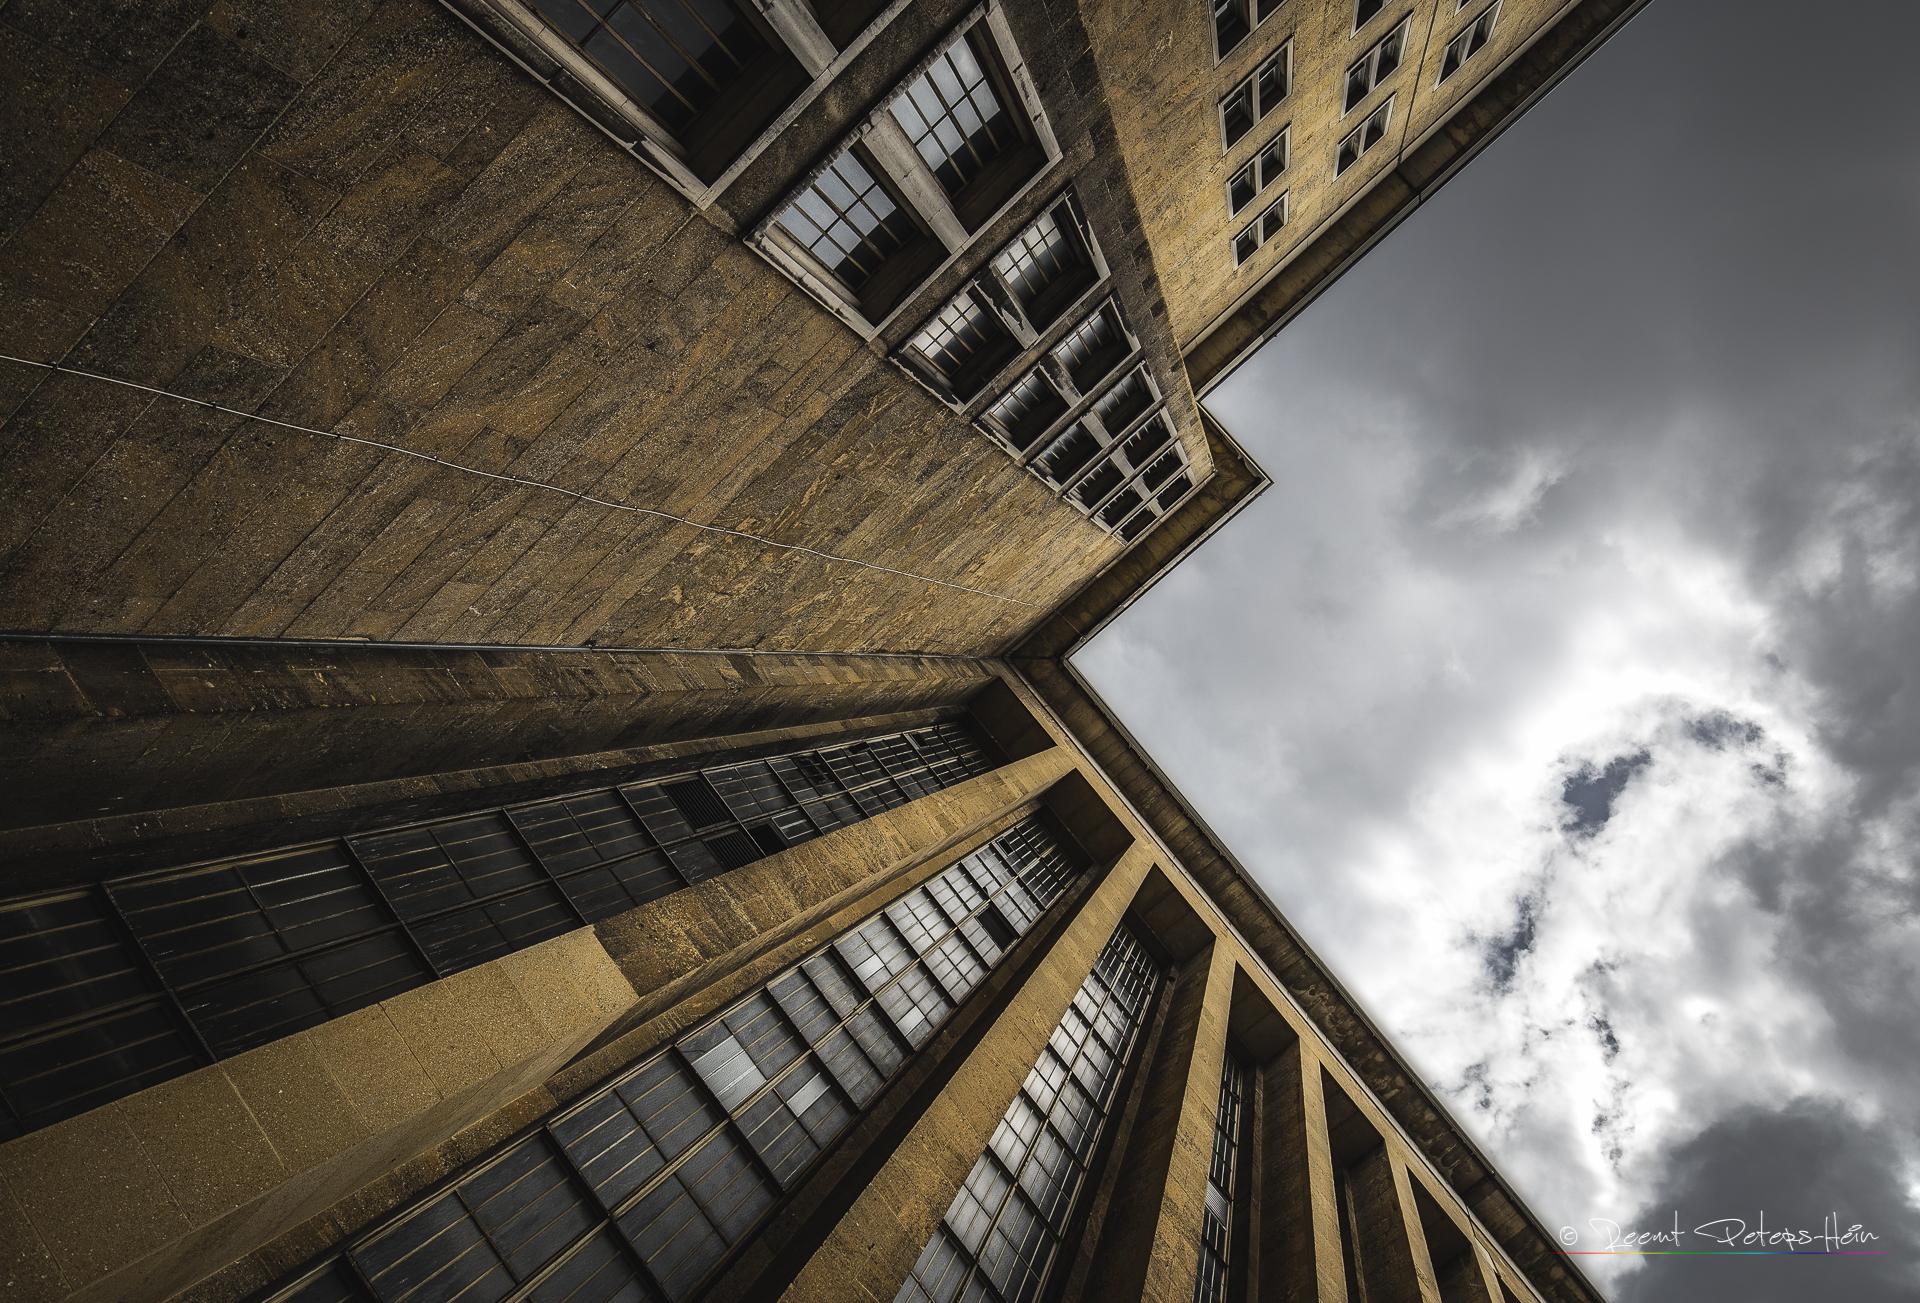 Windows of Tempelhof, Germany